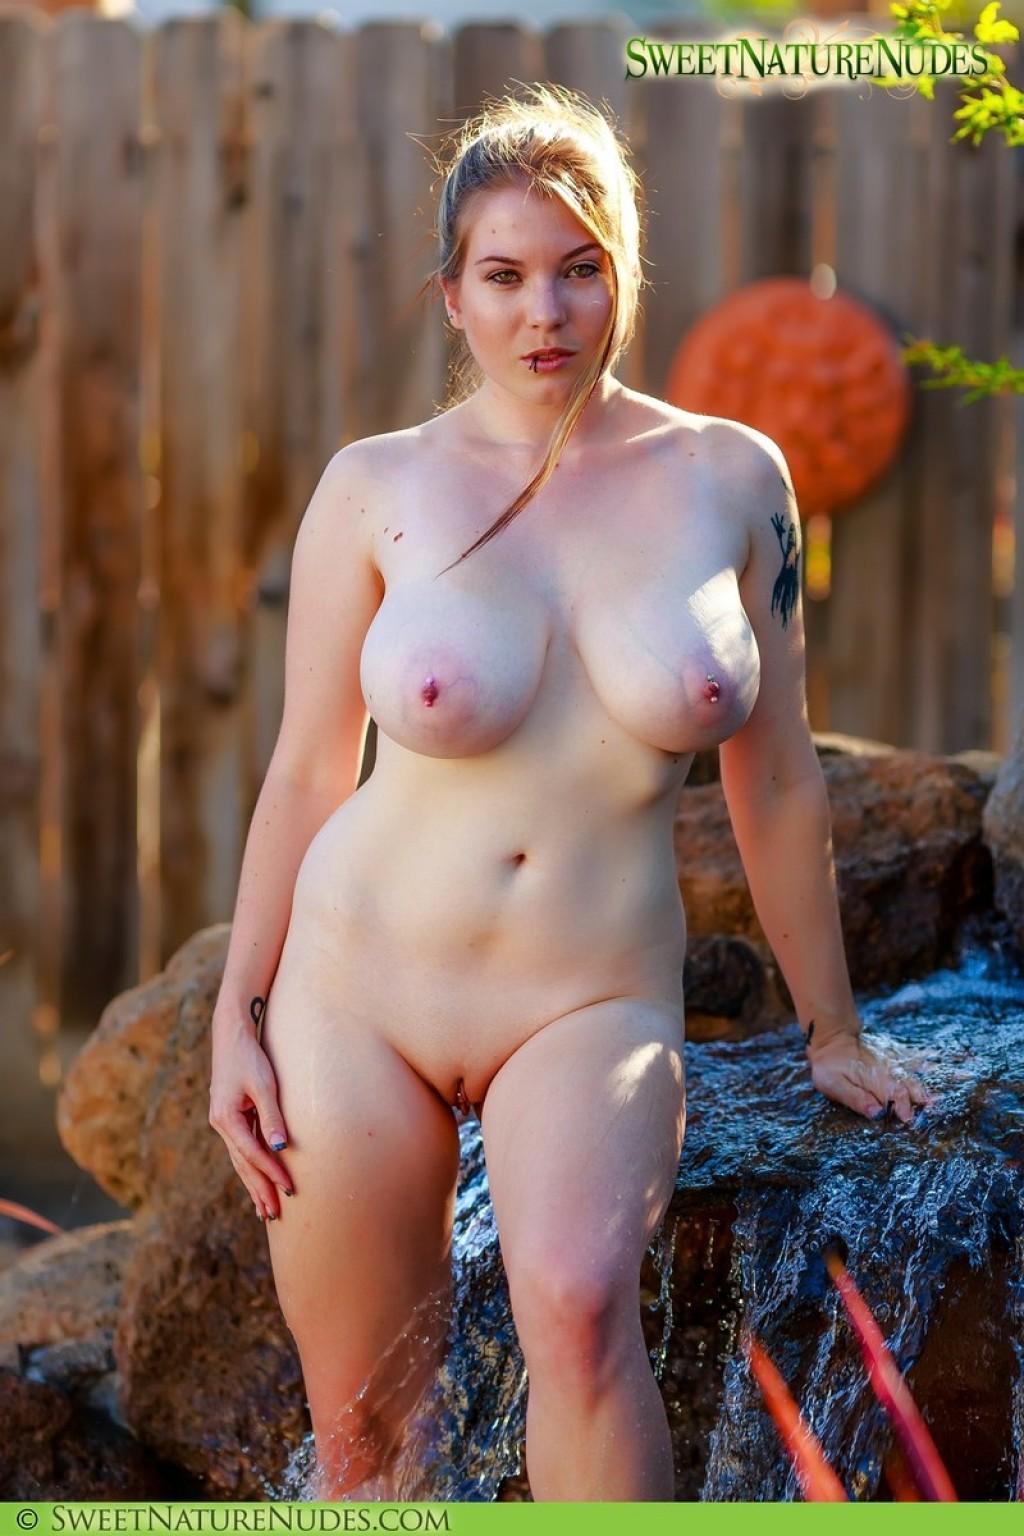 kierra knightly nude pics